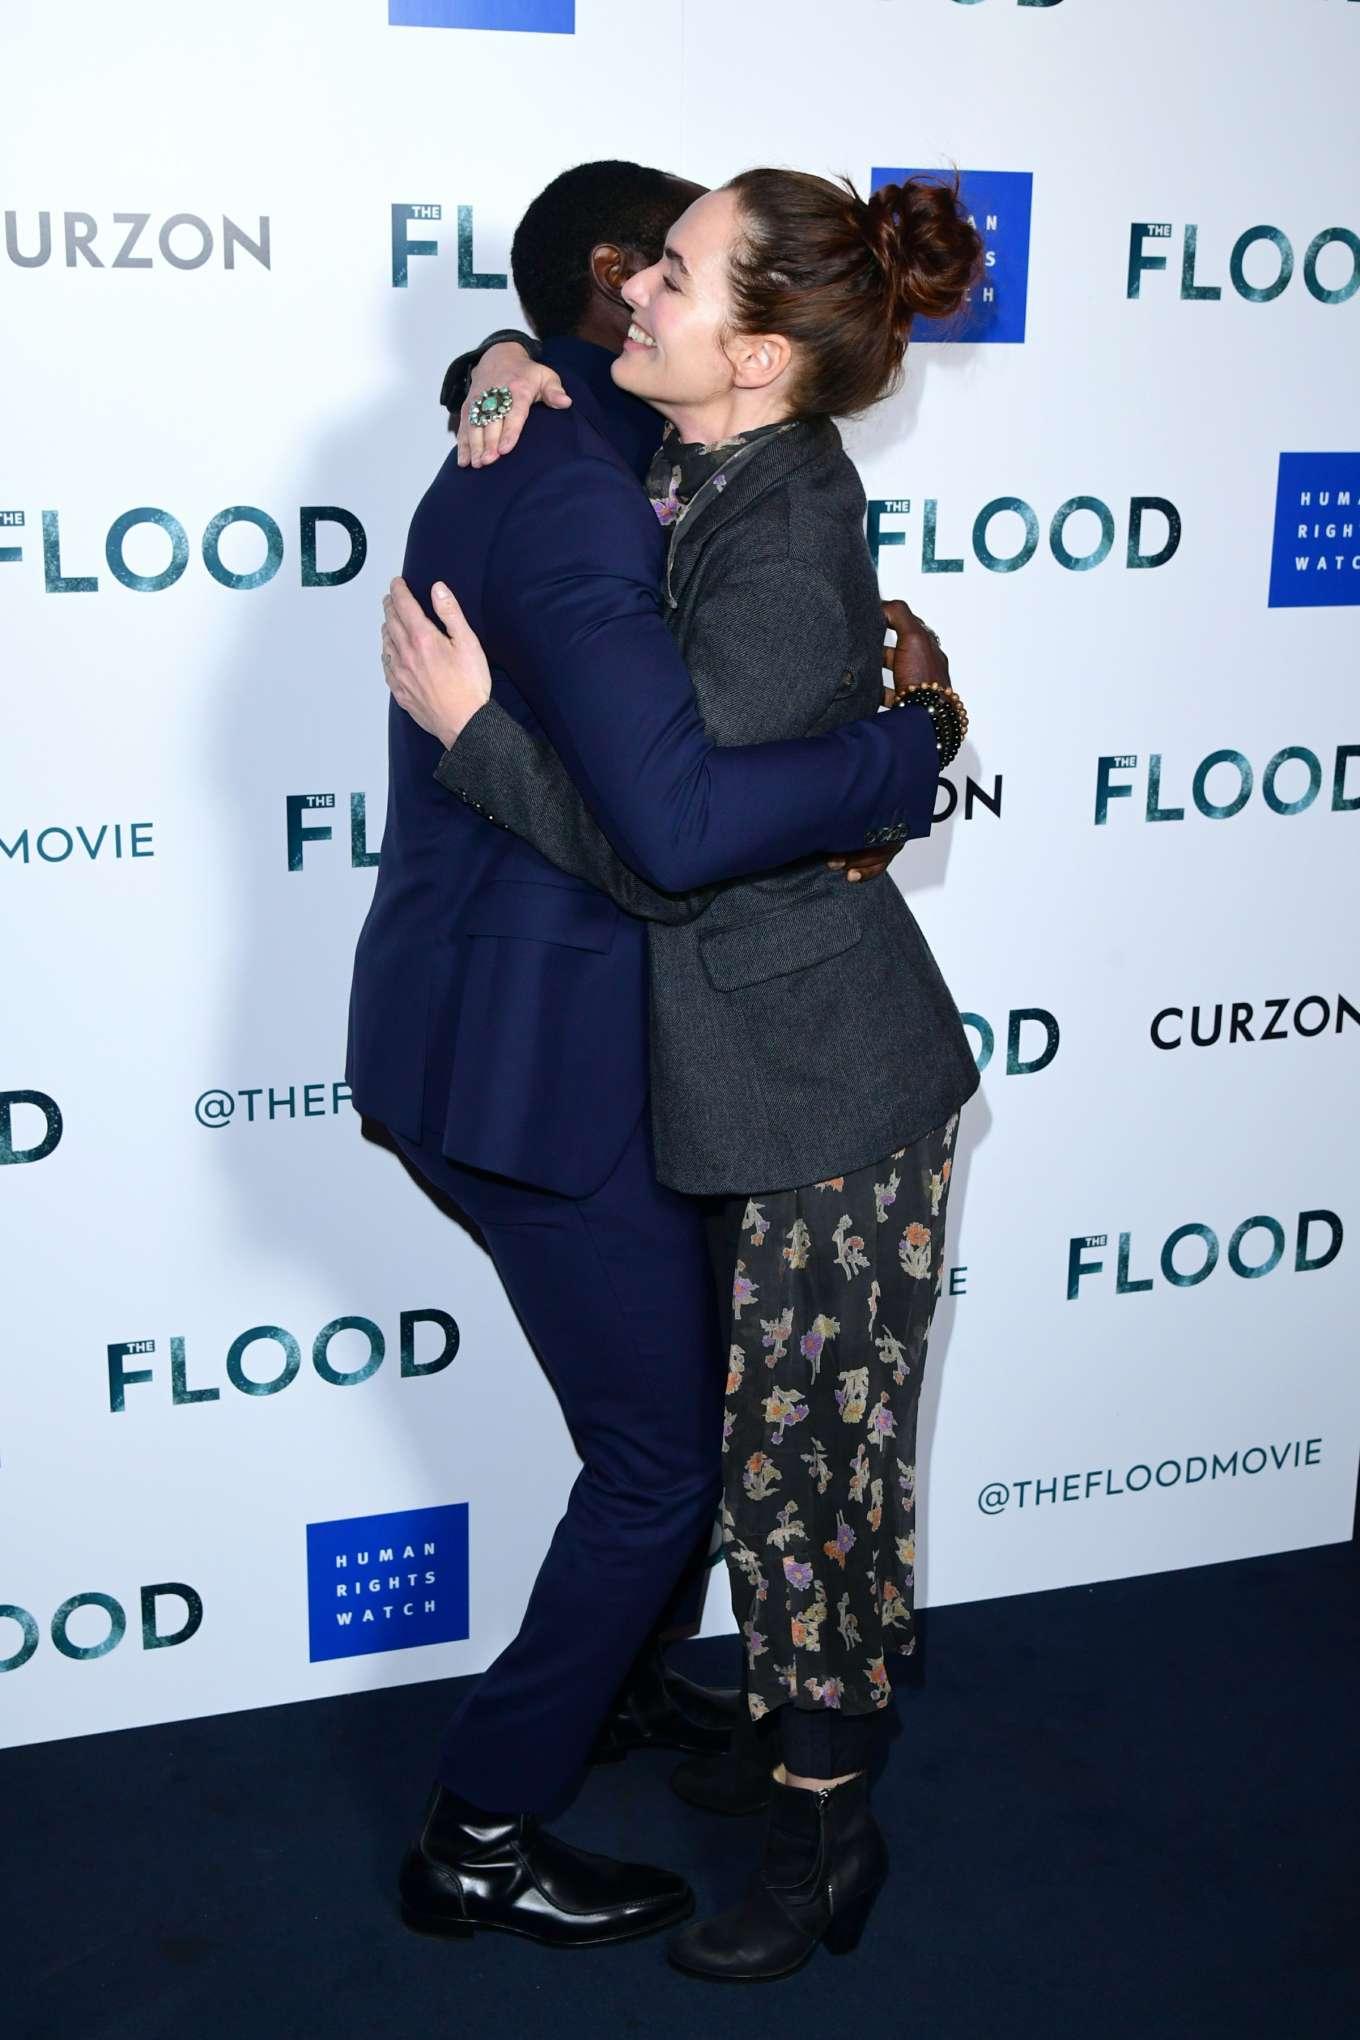 Lena Headey 2019 : Lena Headey: The Flood Screening in London-18